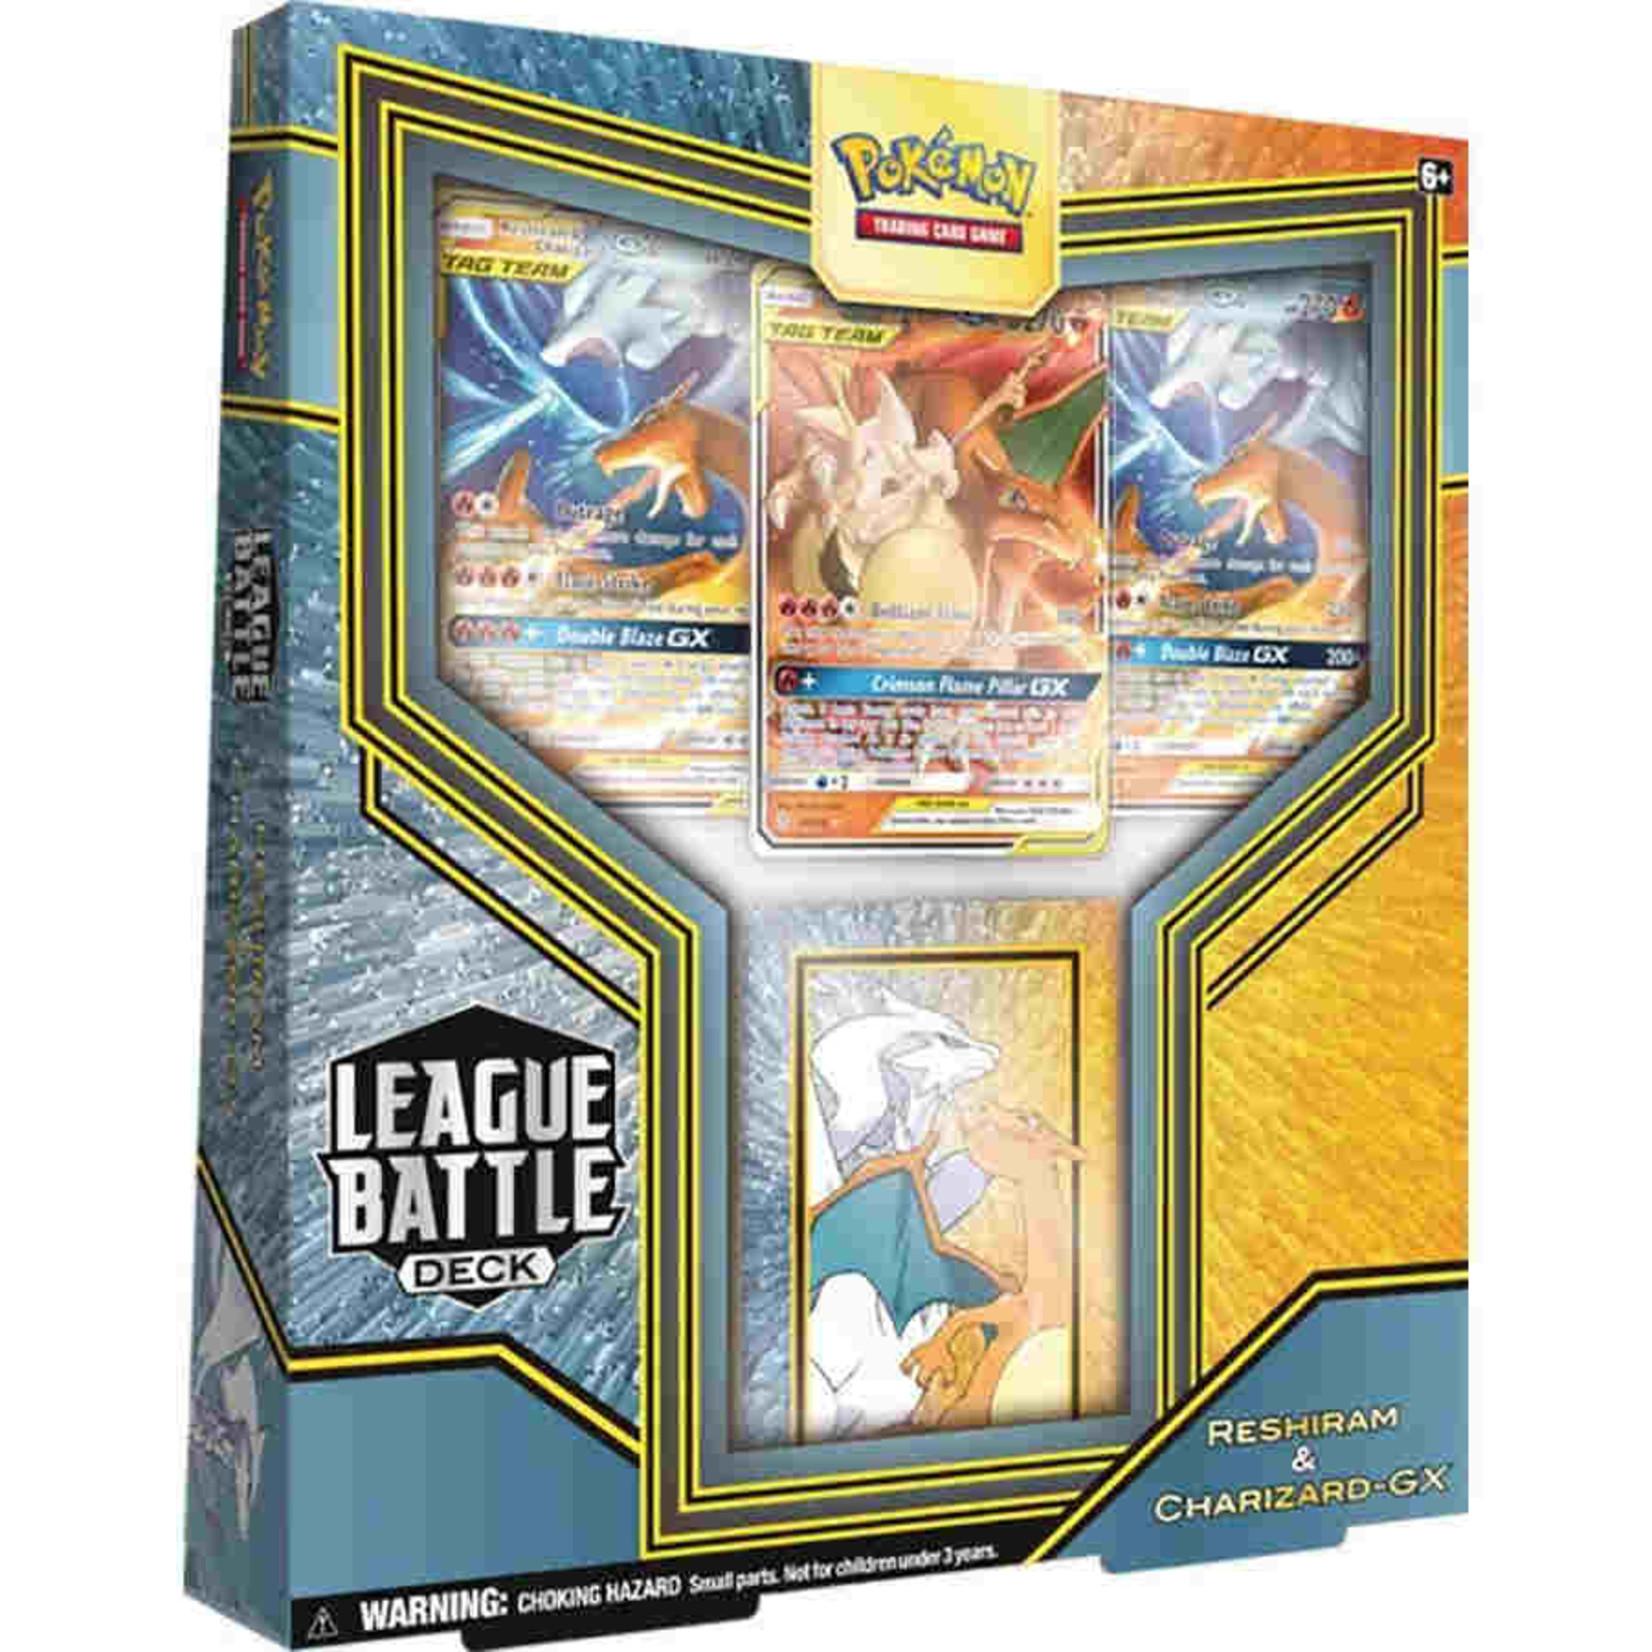 Pokémon TCG: Reshiram & Charizard-GX League Battle Deck